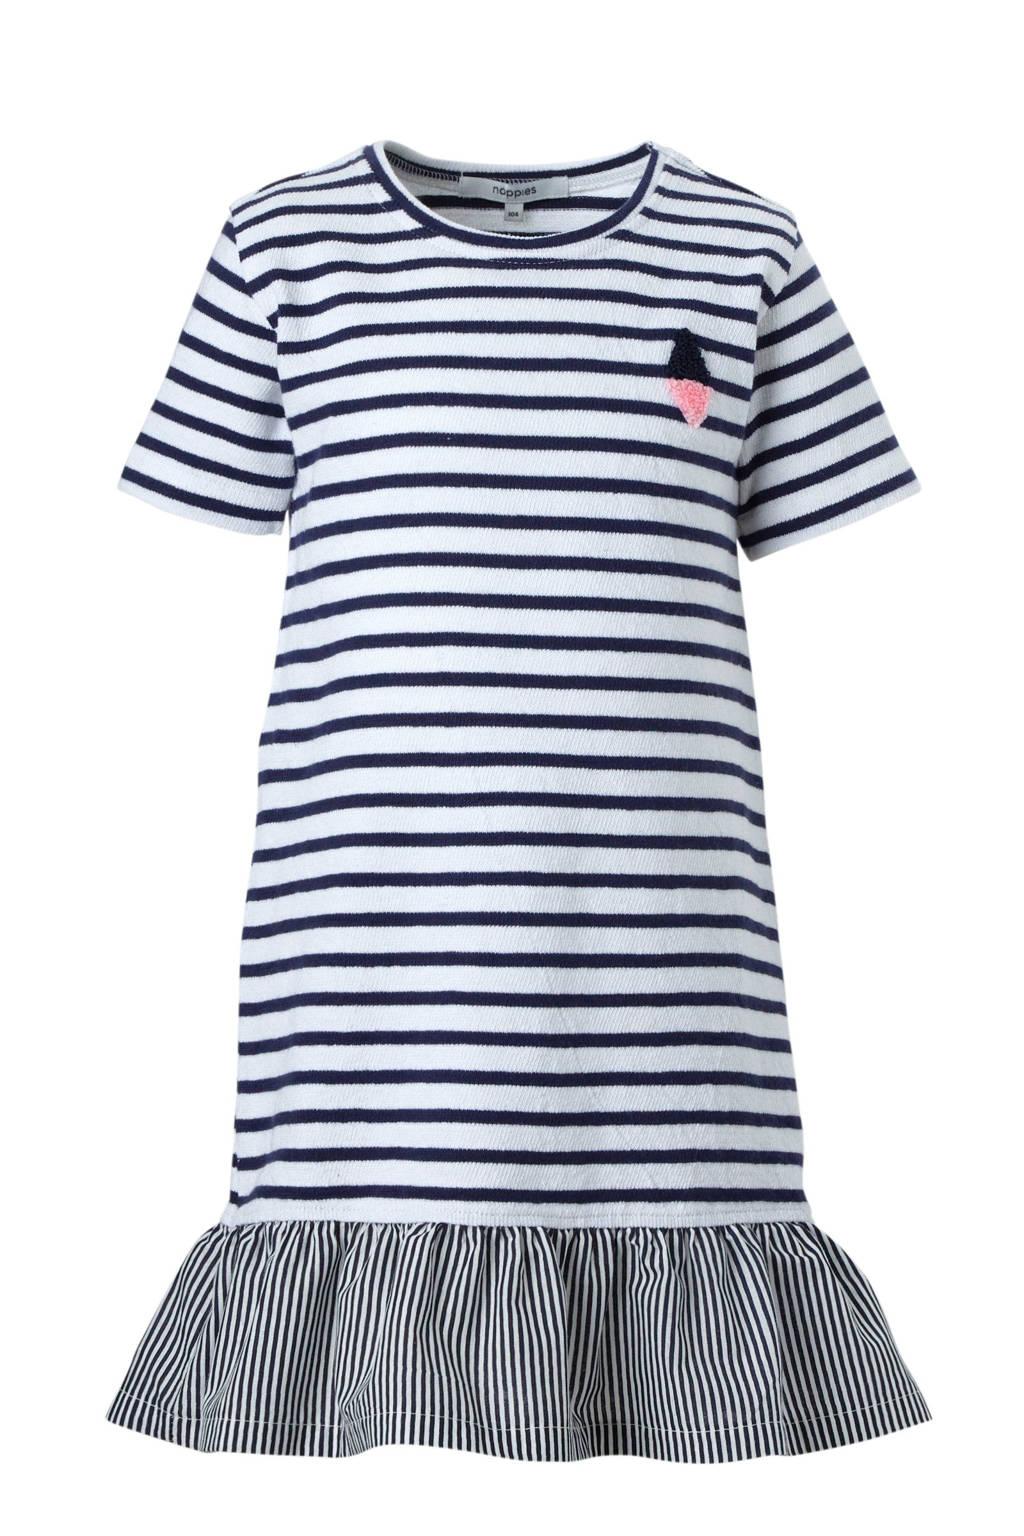 Noppies jurk Rosemead, marine/ wit